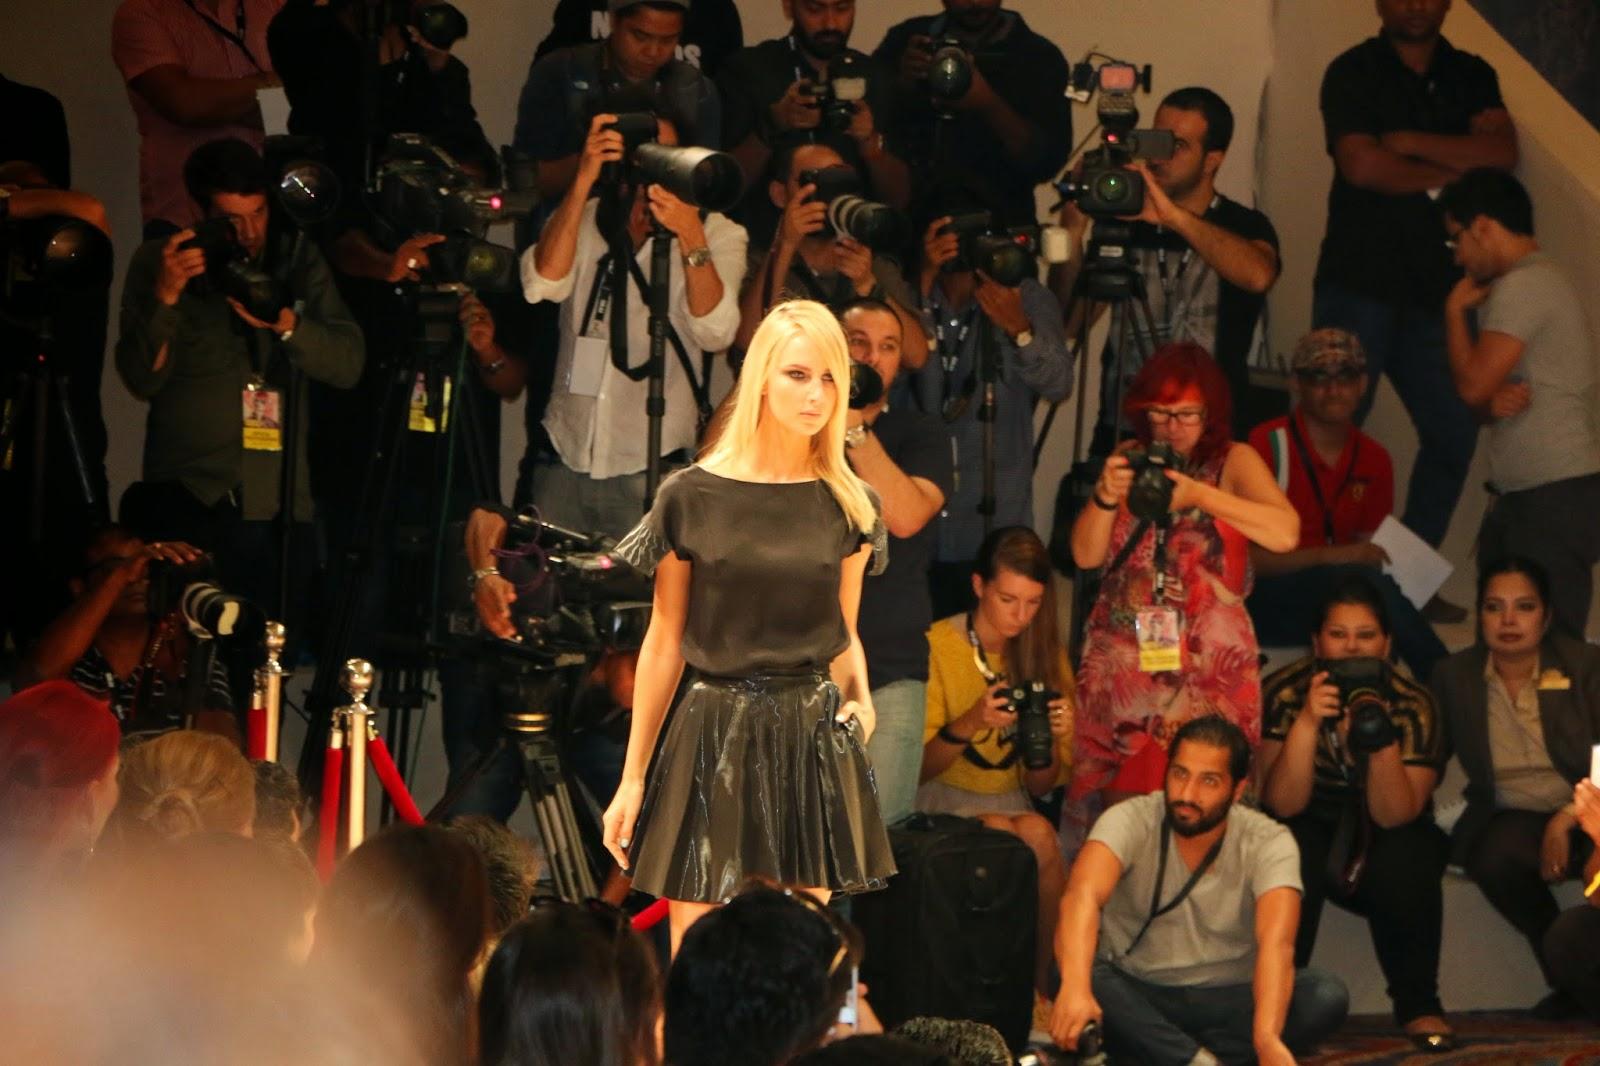 http://gracepantilanan.blogspot.ae/p/blog-page.html